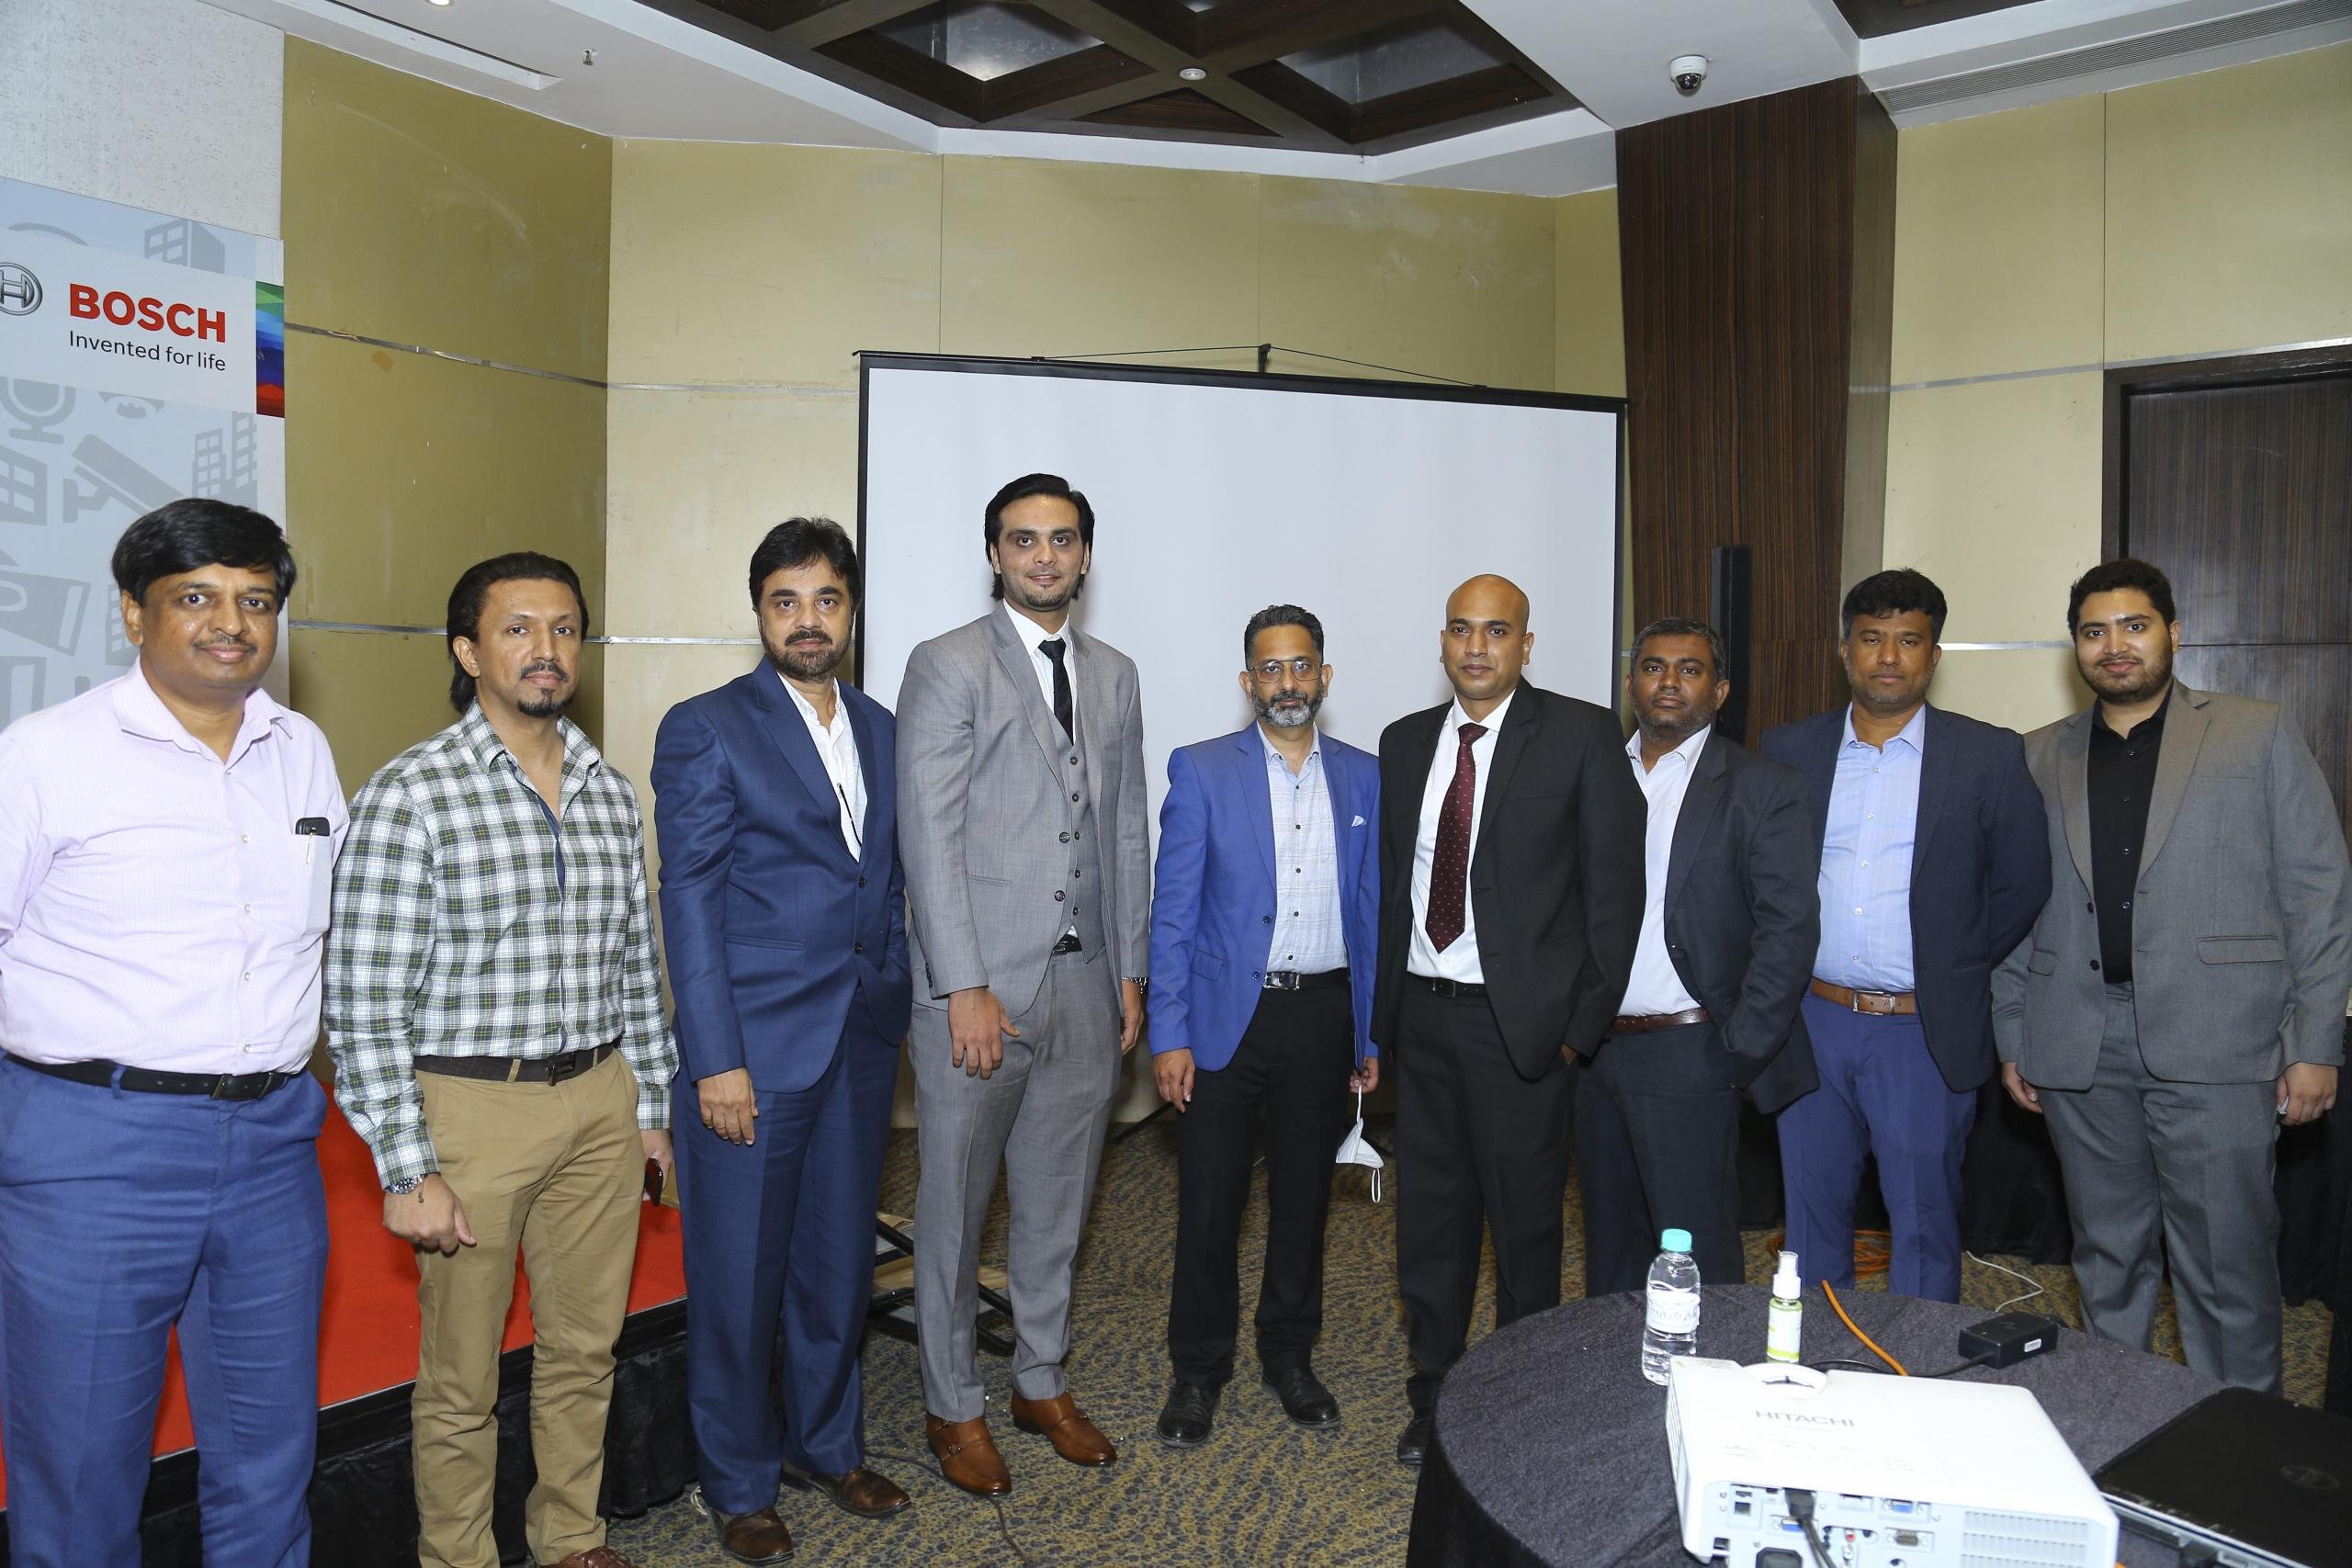 Shah Global Organised Bosch Business Meet in Hyderabad